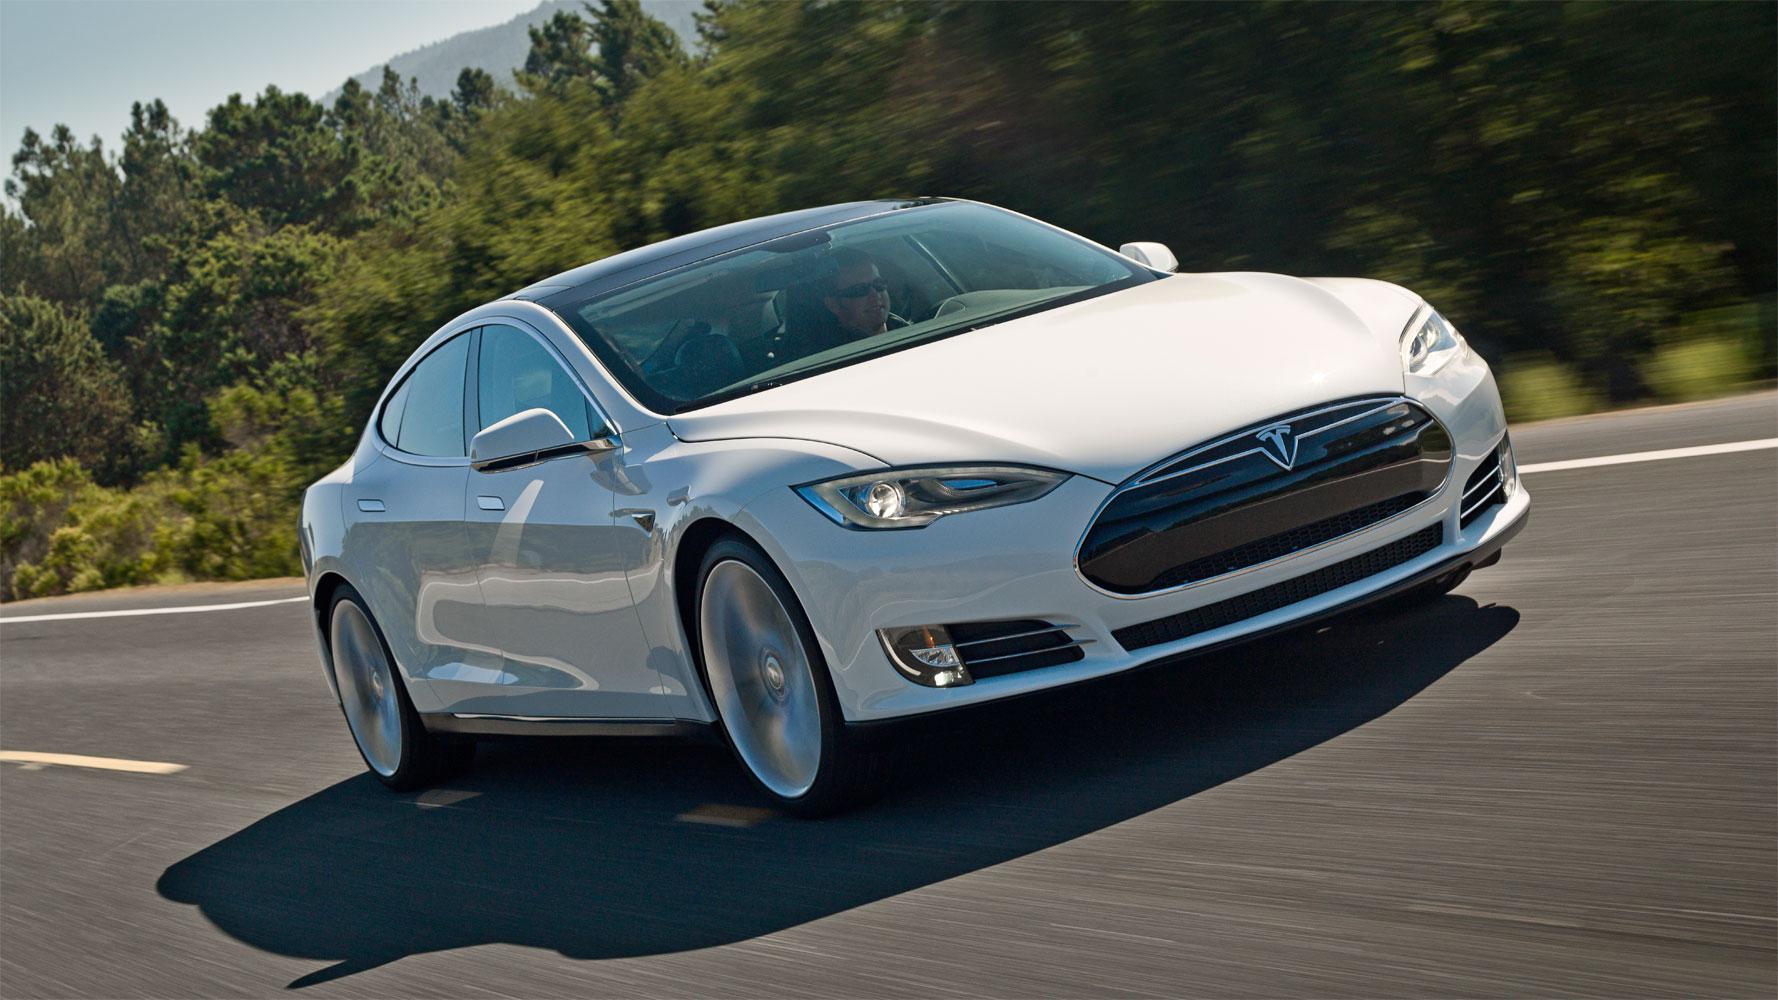 Tesla Model S hält 8,4% am Luxussegment in den USA